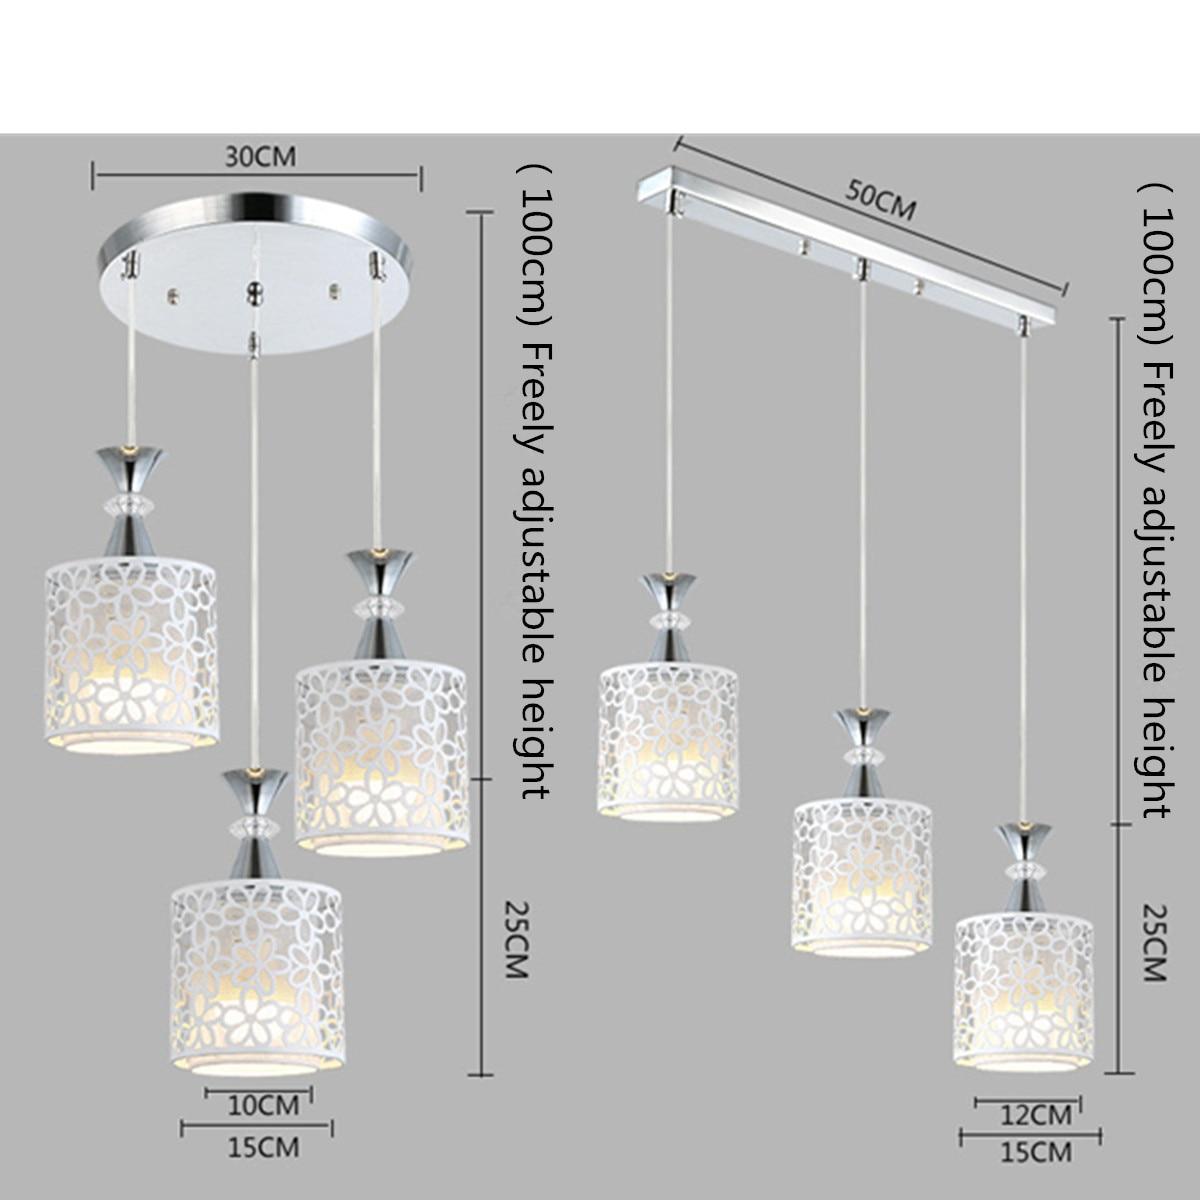 HTB14ZhCbznuK1RkSmFPq6AuzFXaM Crystal Ceiling Lamp | Crystal Ceiling Lights | Modern LED Lamps For Living Room Dining Room Glass Ceiling Lights Voltage 220V